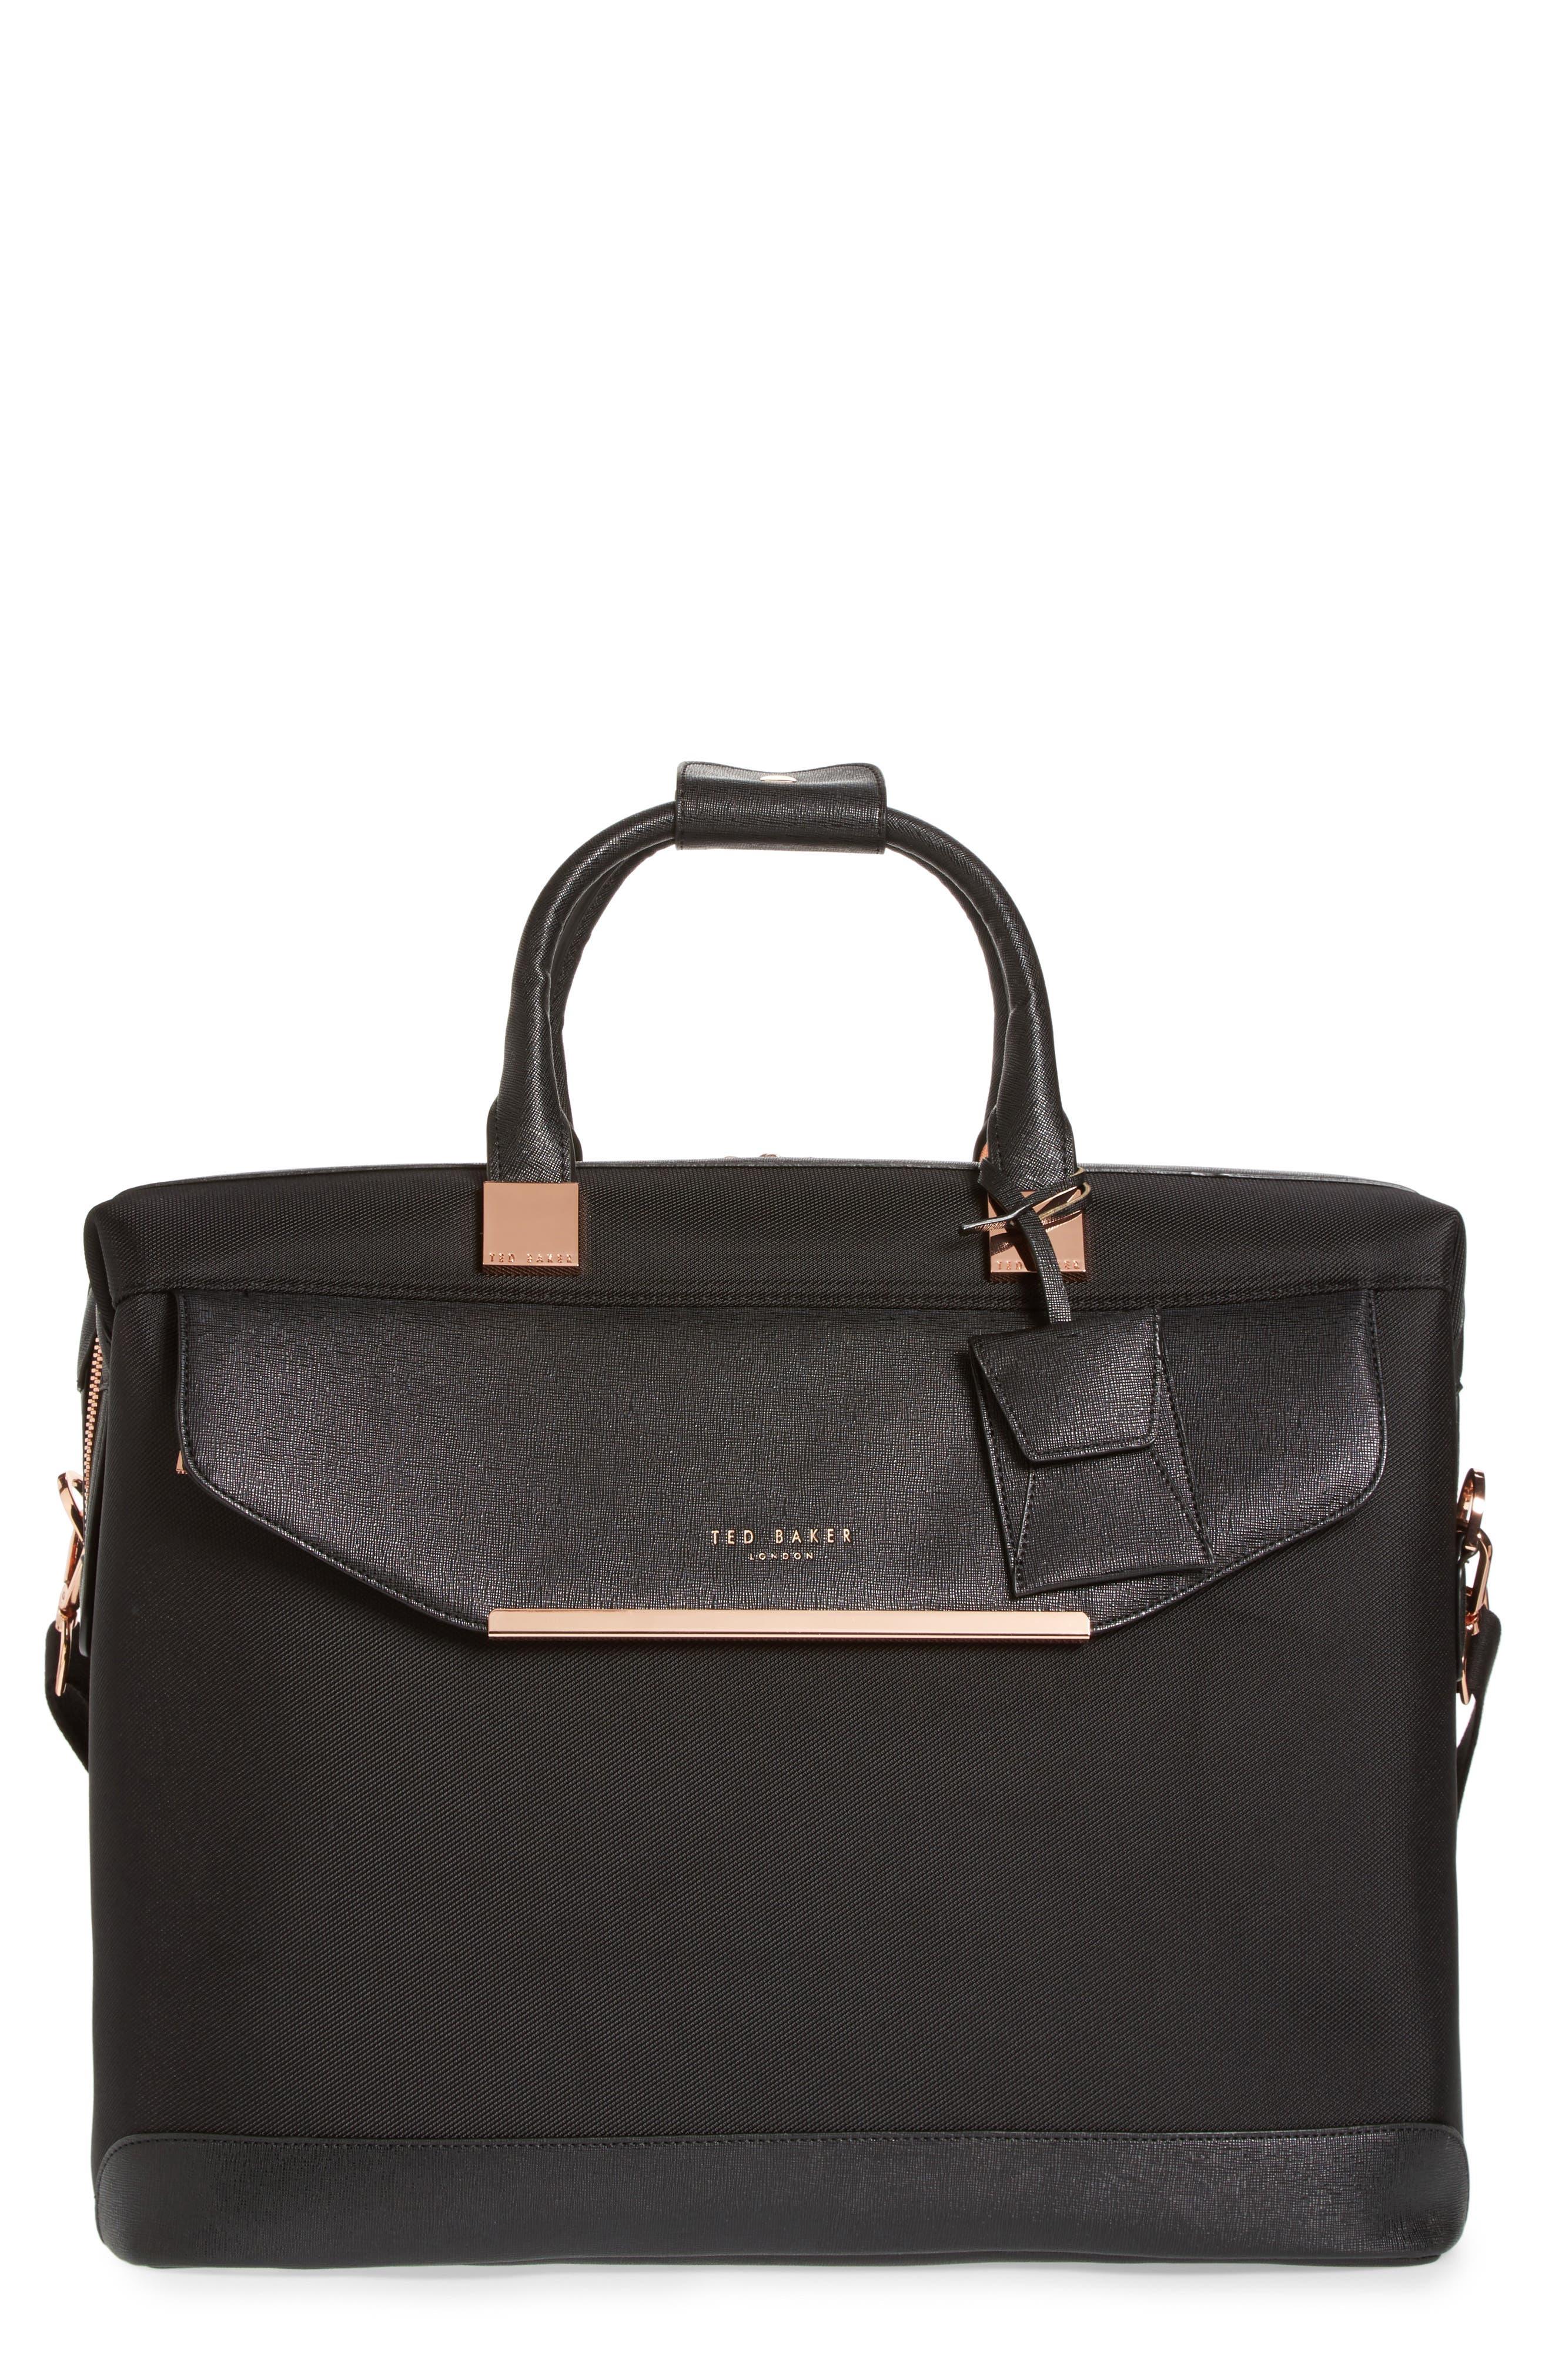 Alternate Image 1 Selected - Ted Baker London Small Albany Duffel Bag